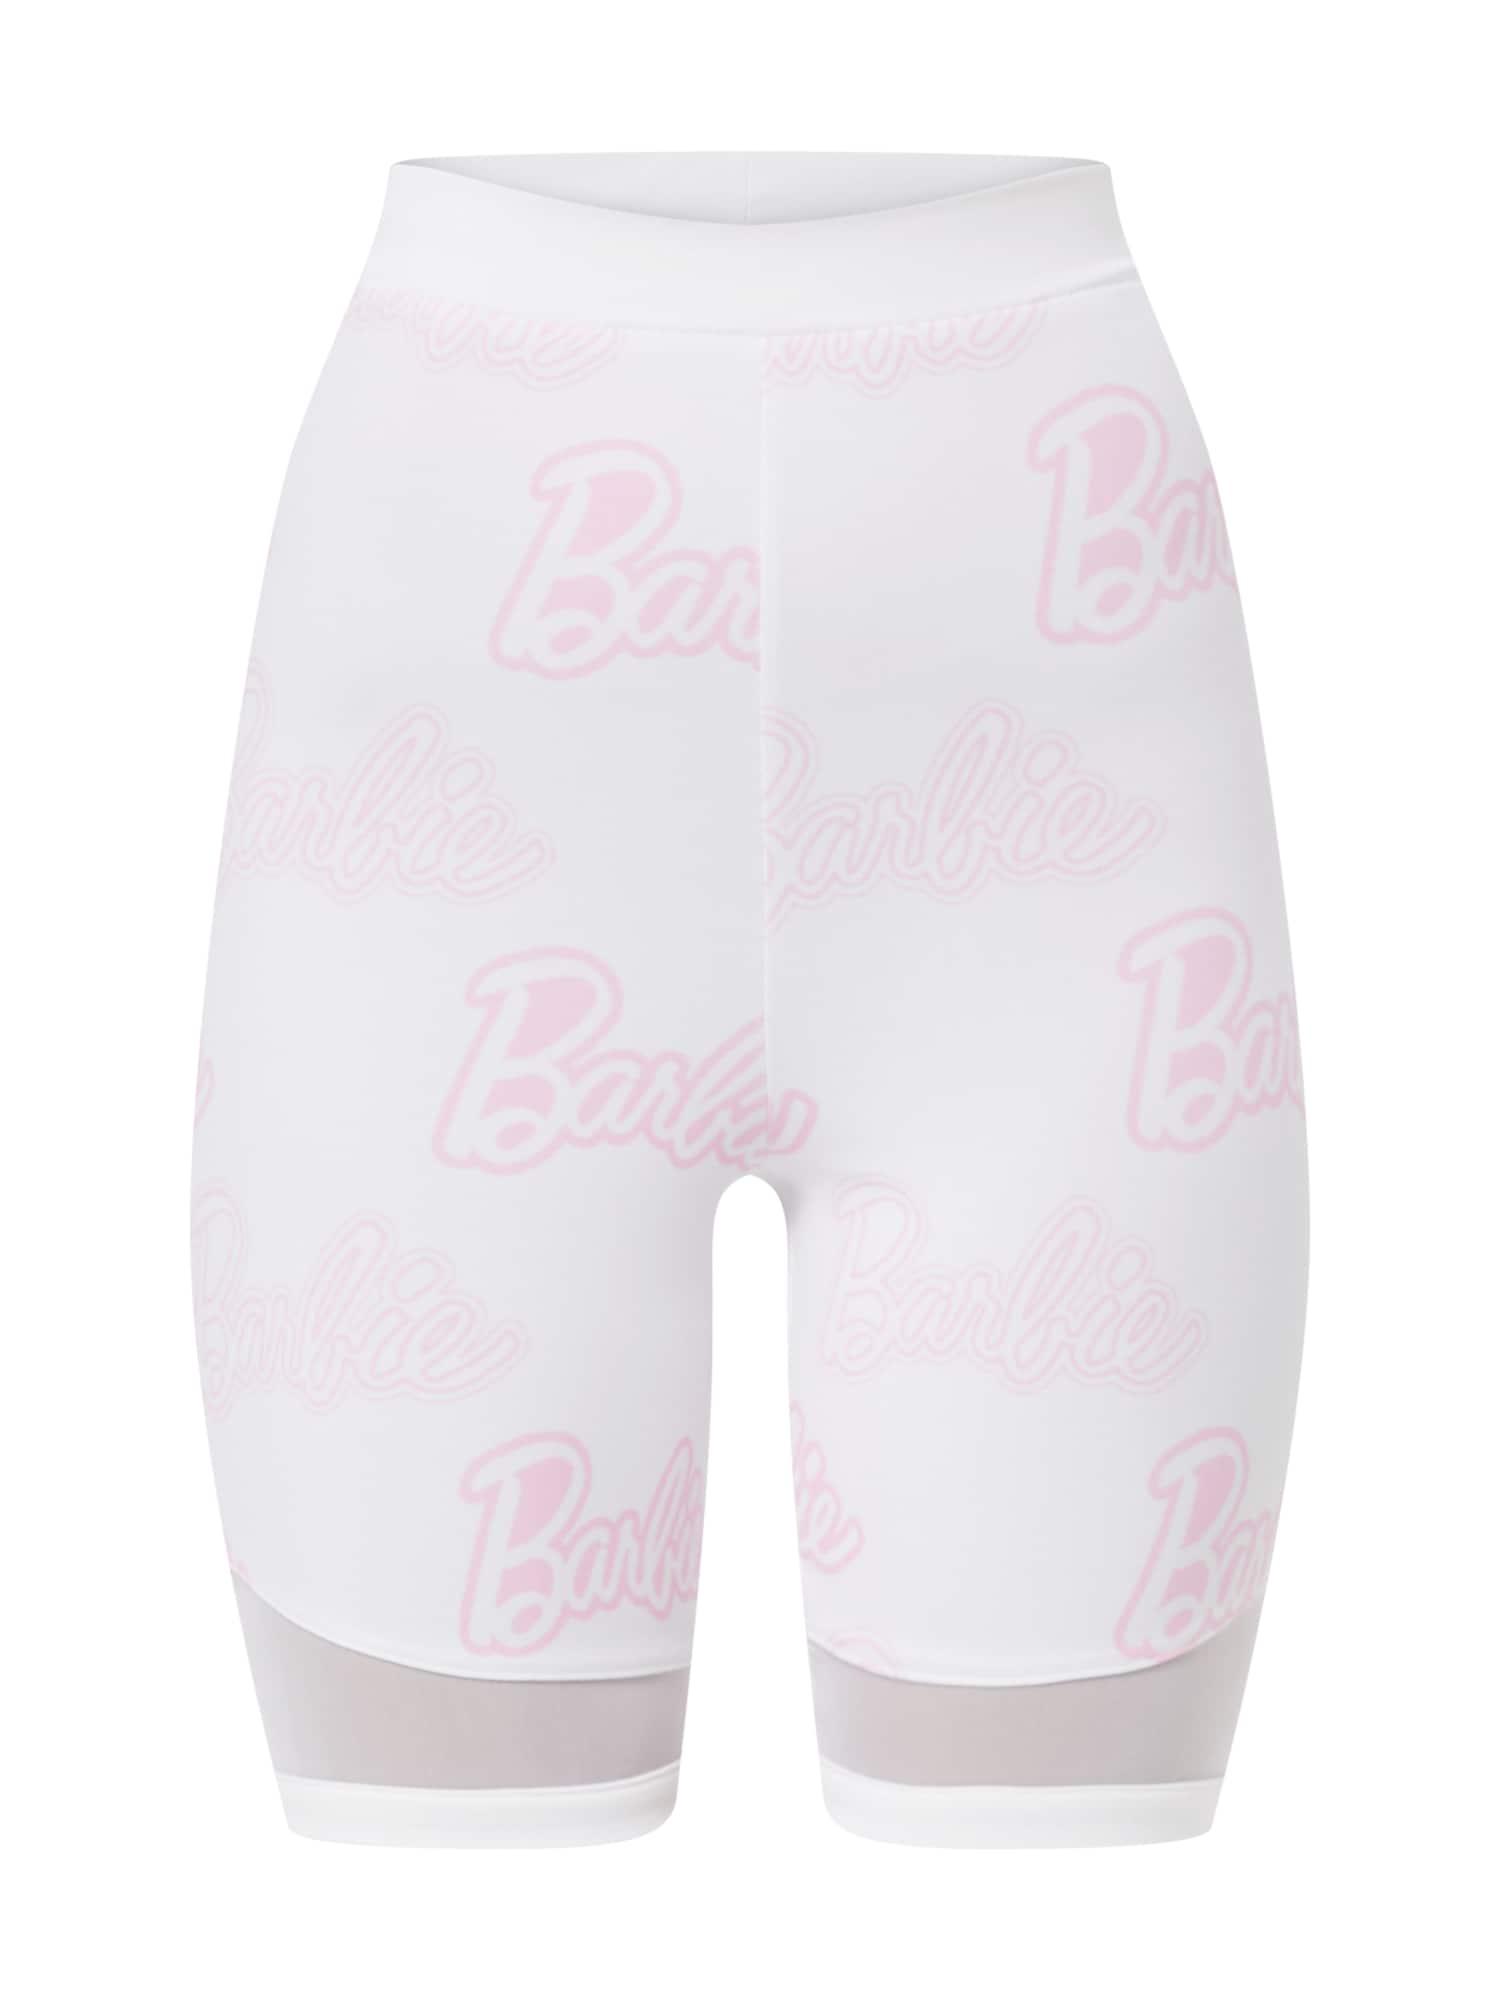 Legíny Nela Pant pink bílá ABOUT YOU X Barbie